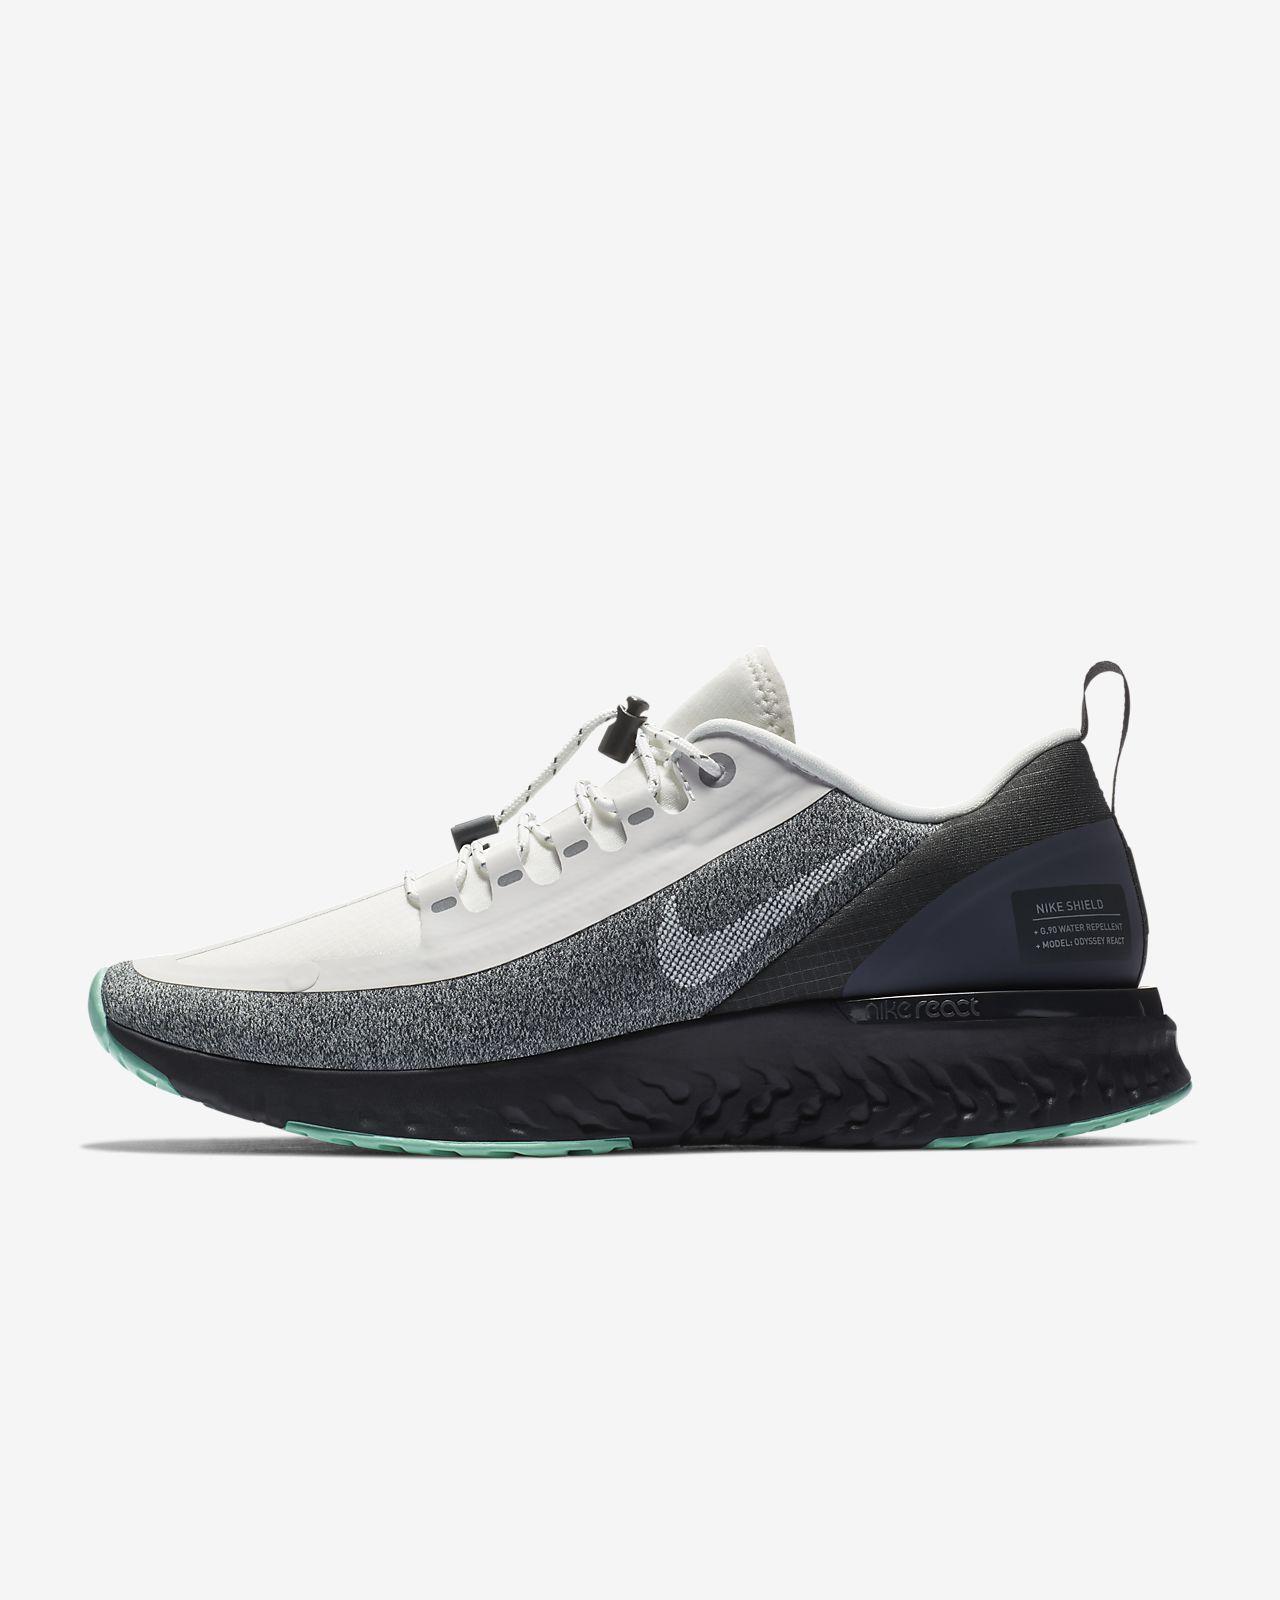 Nike Odyssey React Shield Herren Laufschuh schwarz cool grey